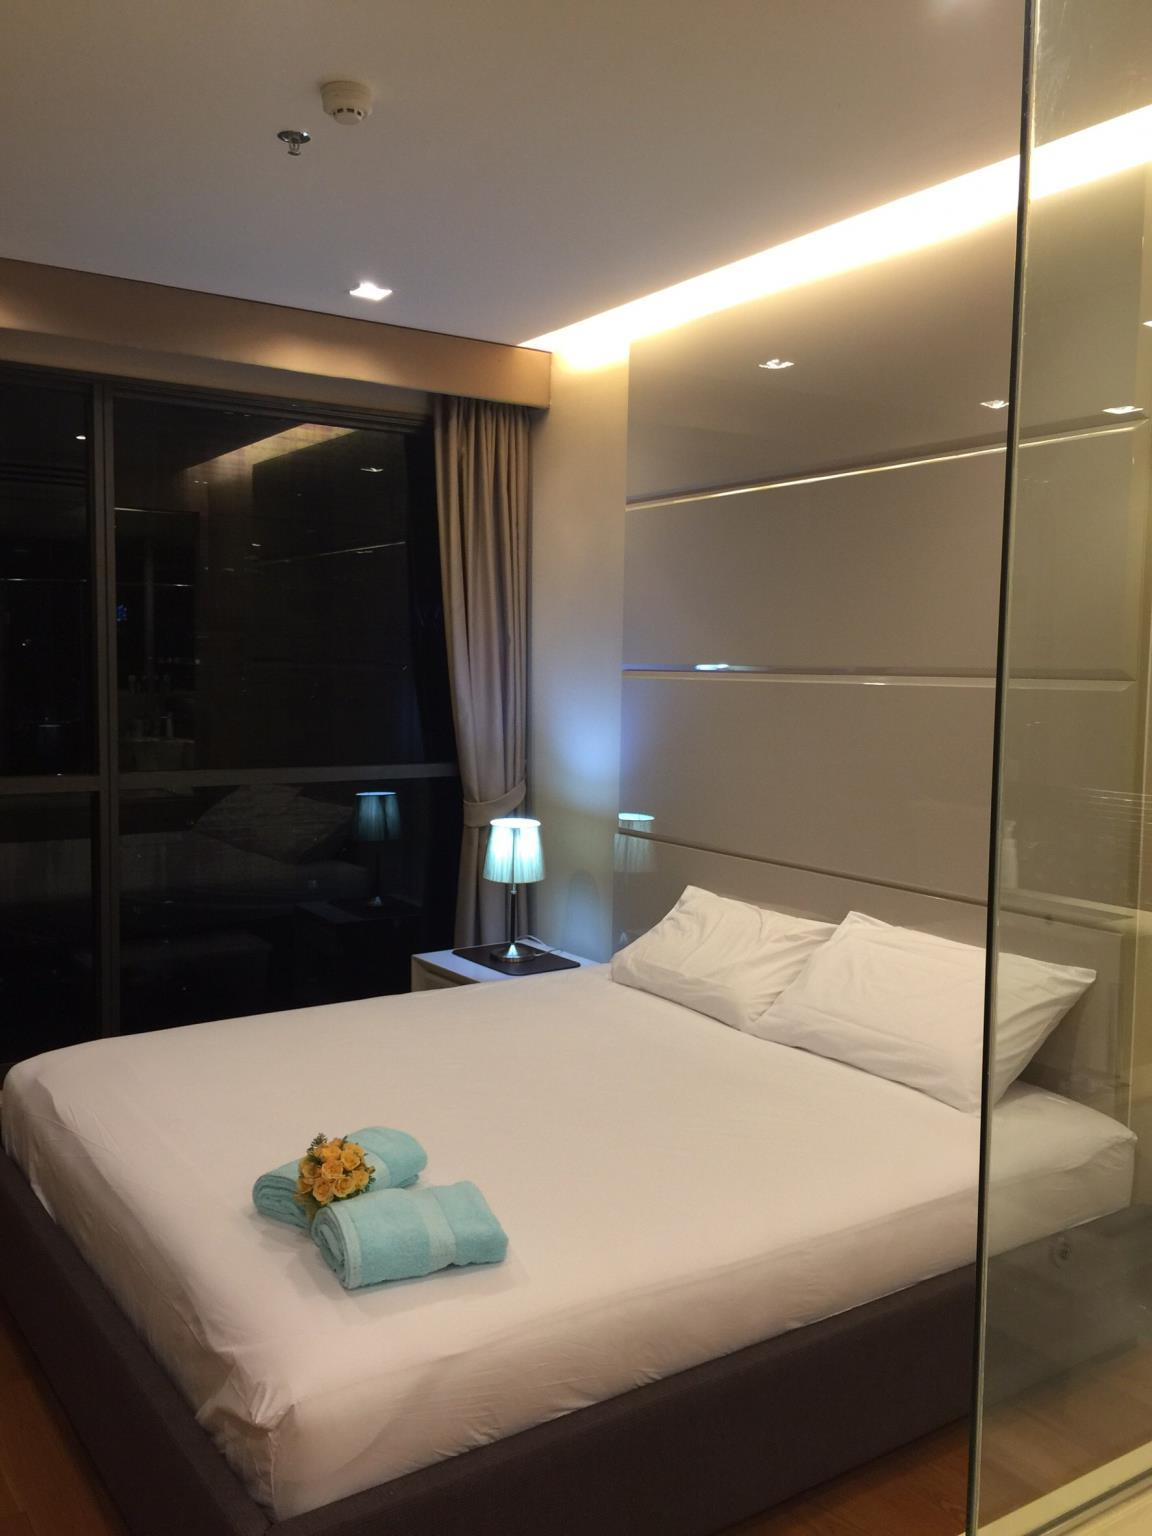 Luxury 2BDs 2Mins BTS @Heart of Bangkok